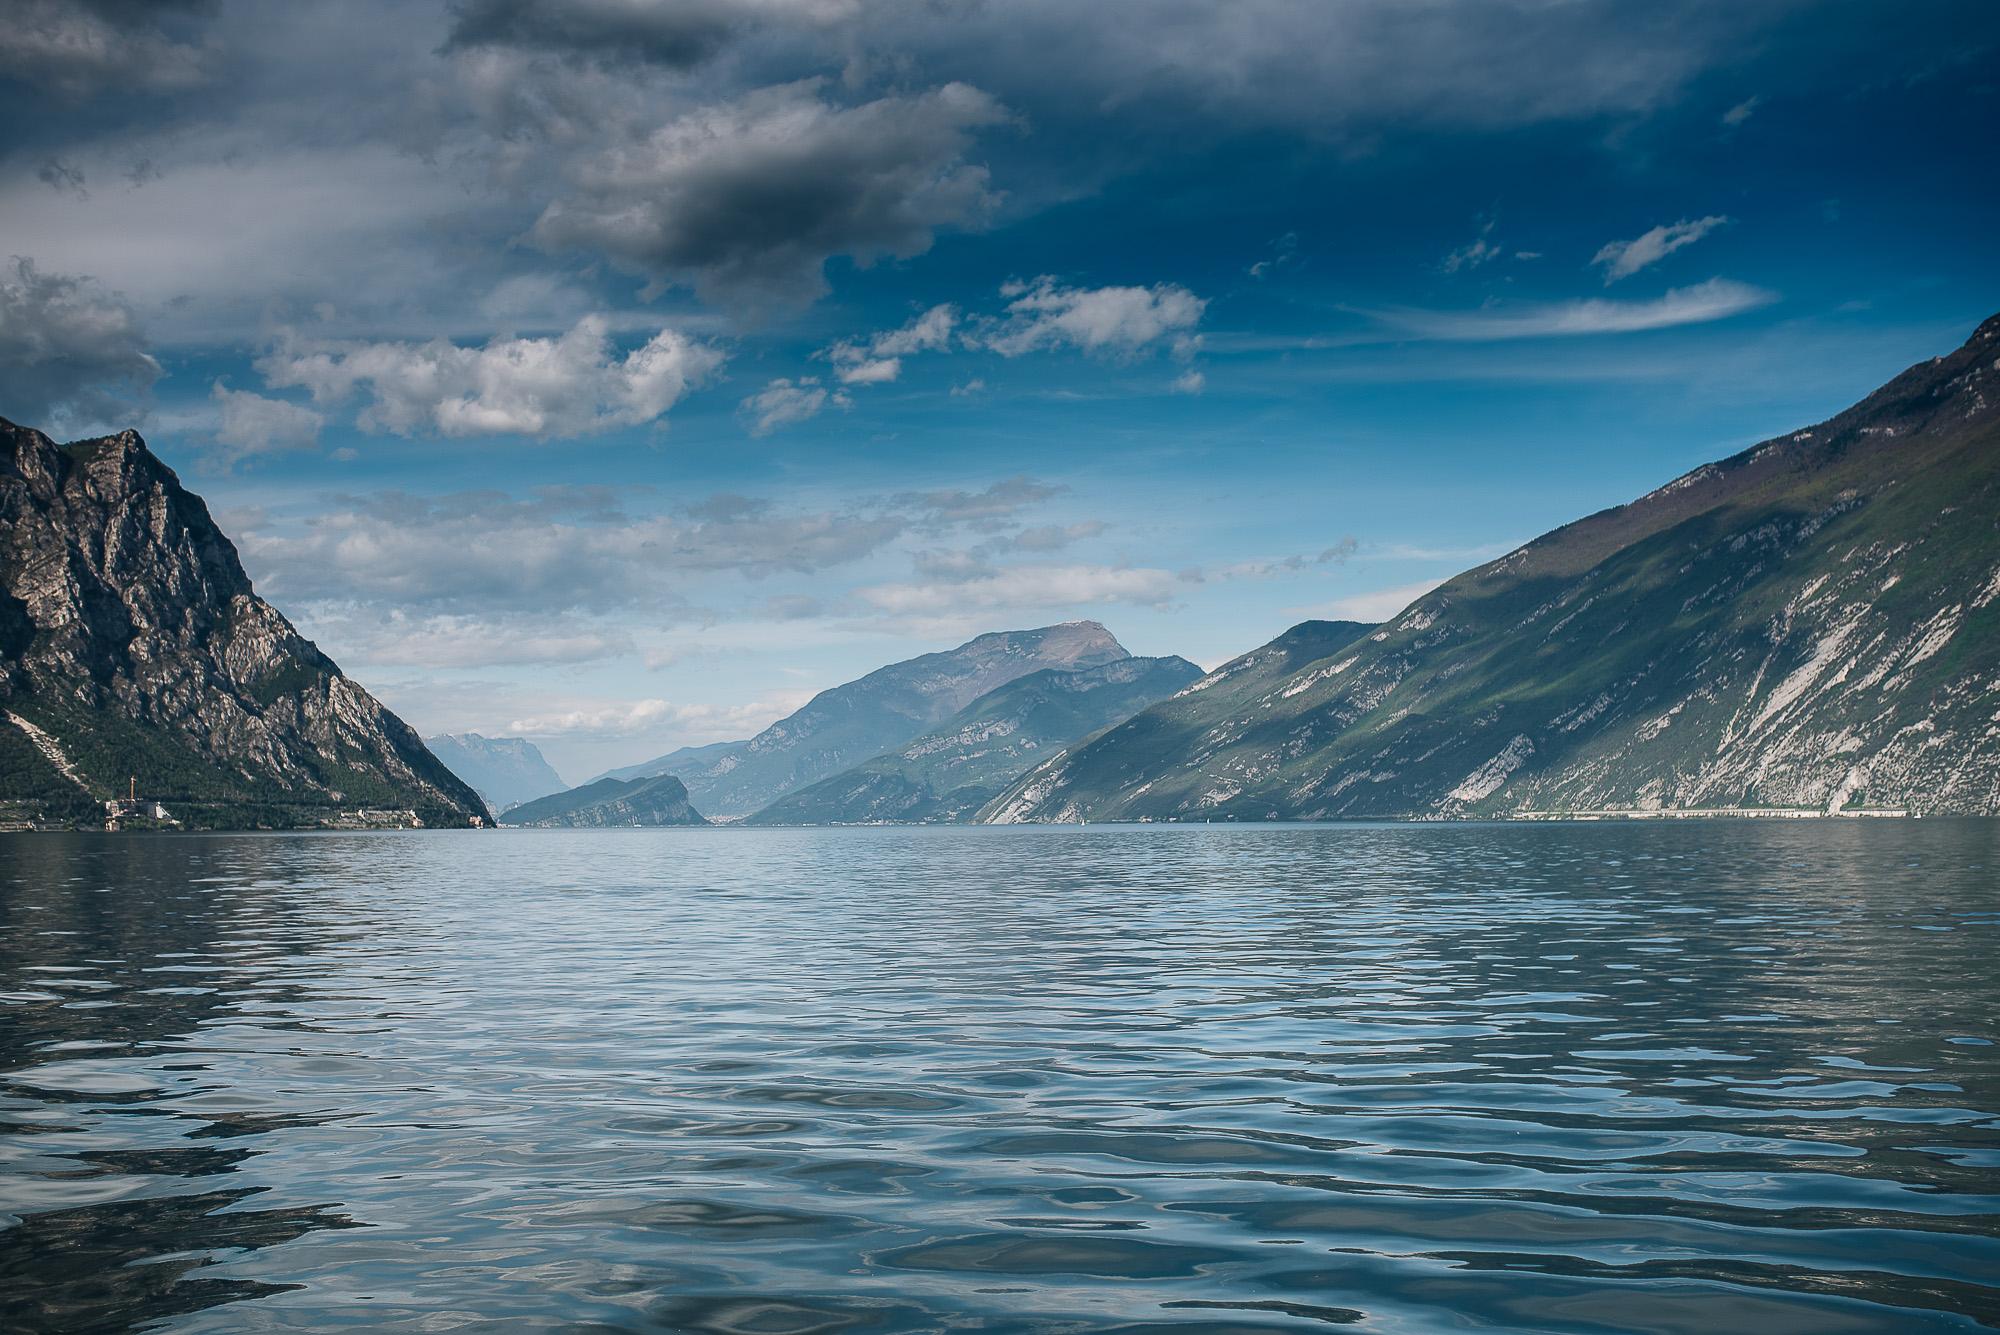 OurBeautifulAdventure-LakeGarda-Italy-Blog-1337.jpg